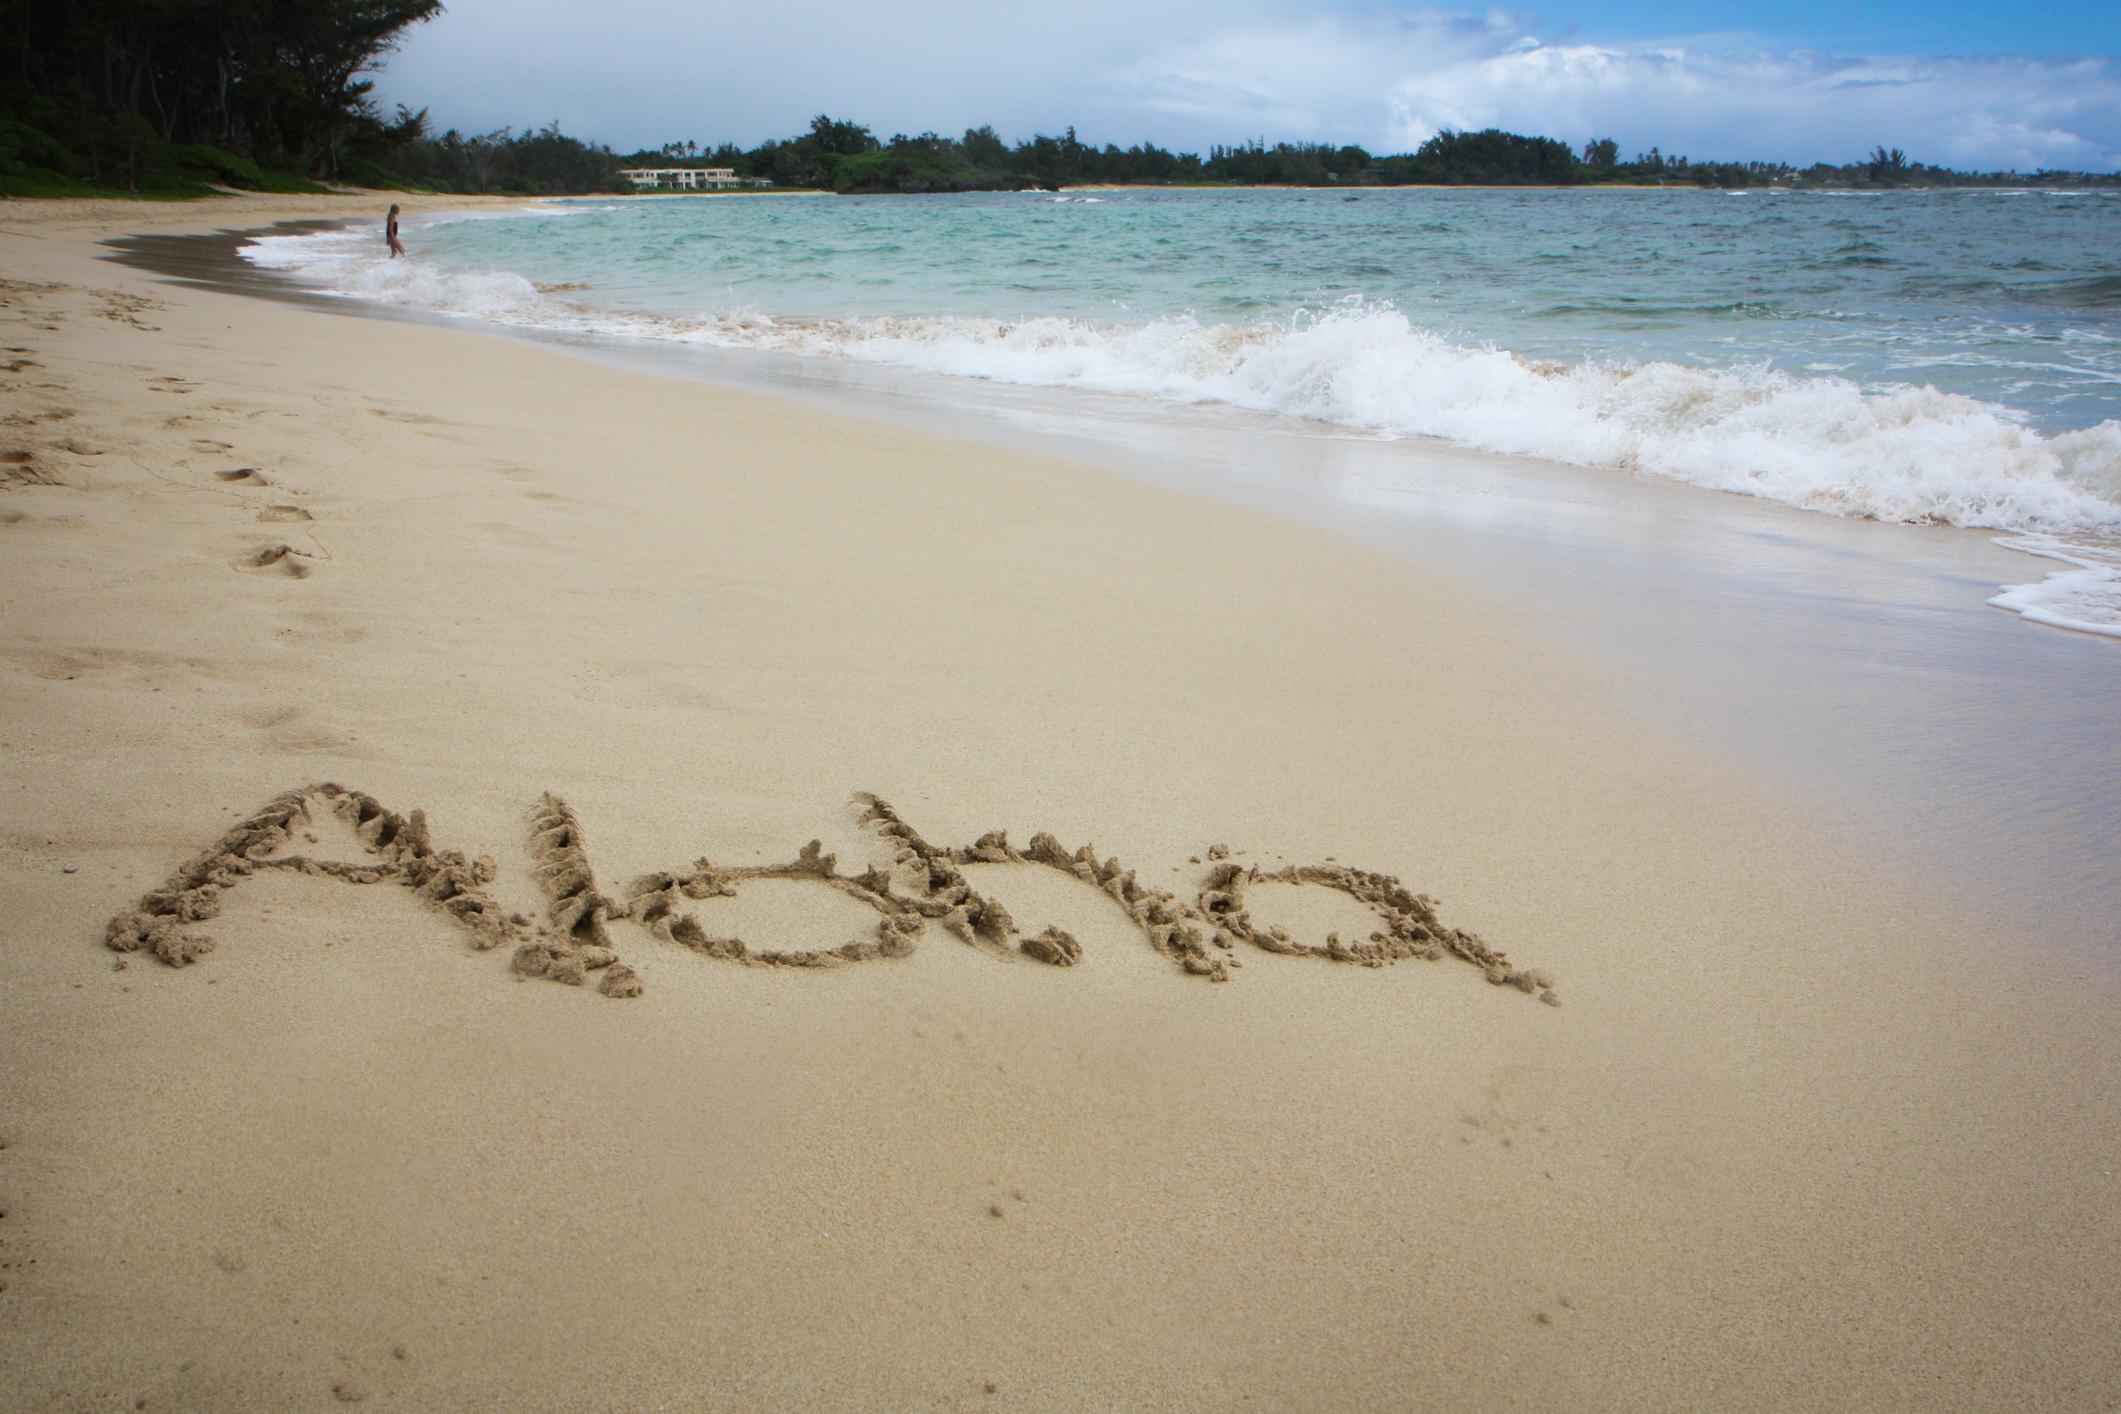 The word aloha is written the in the sand of a beach on the Hawaiian island of Oahu Not So SAHM